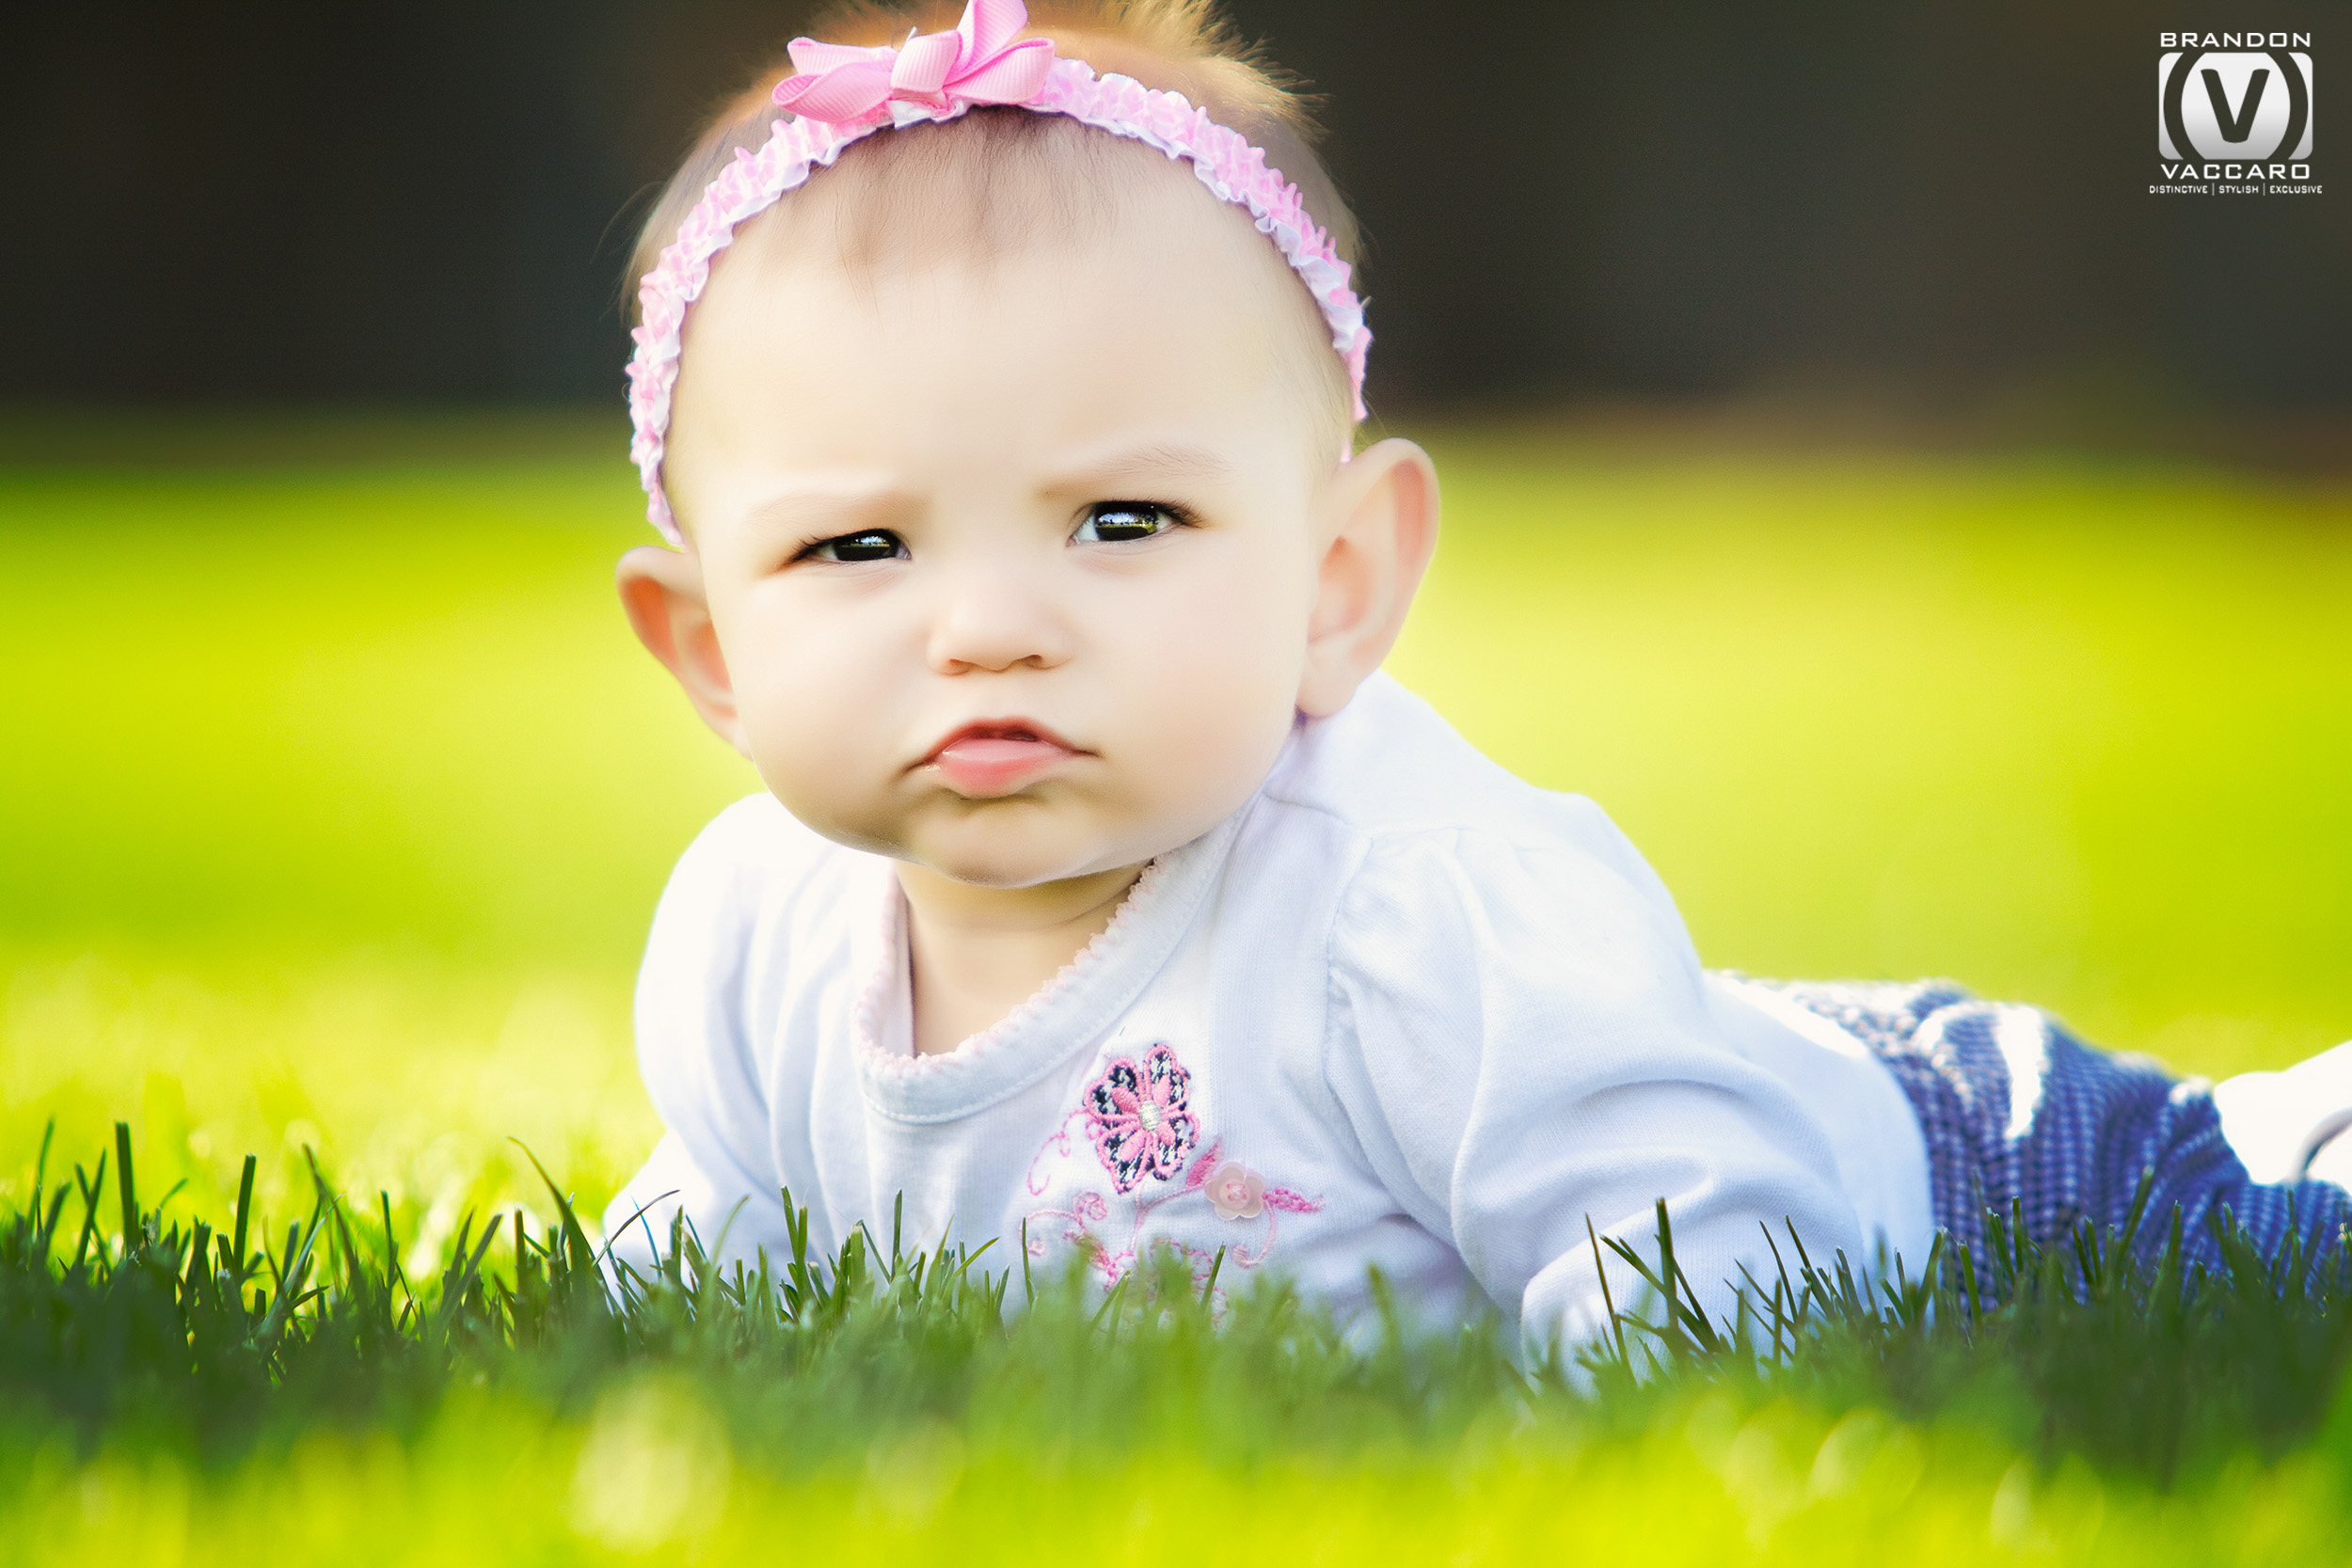 childrens-portraits-photographer-redwood-city.jpg